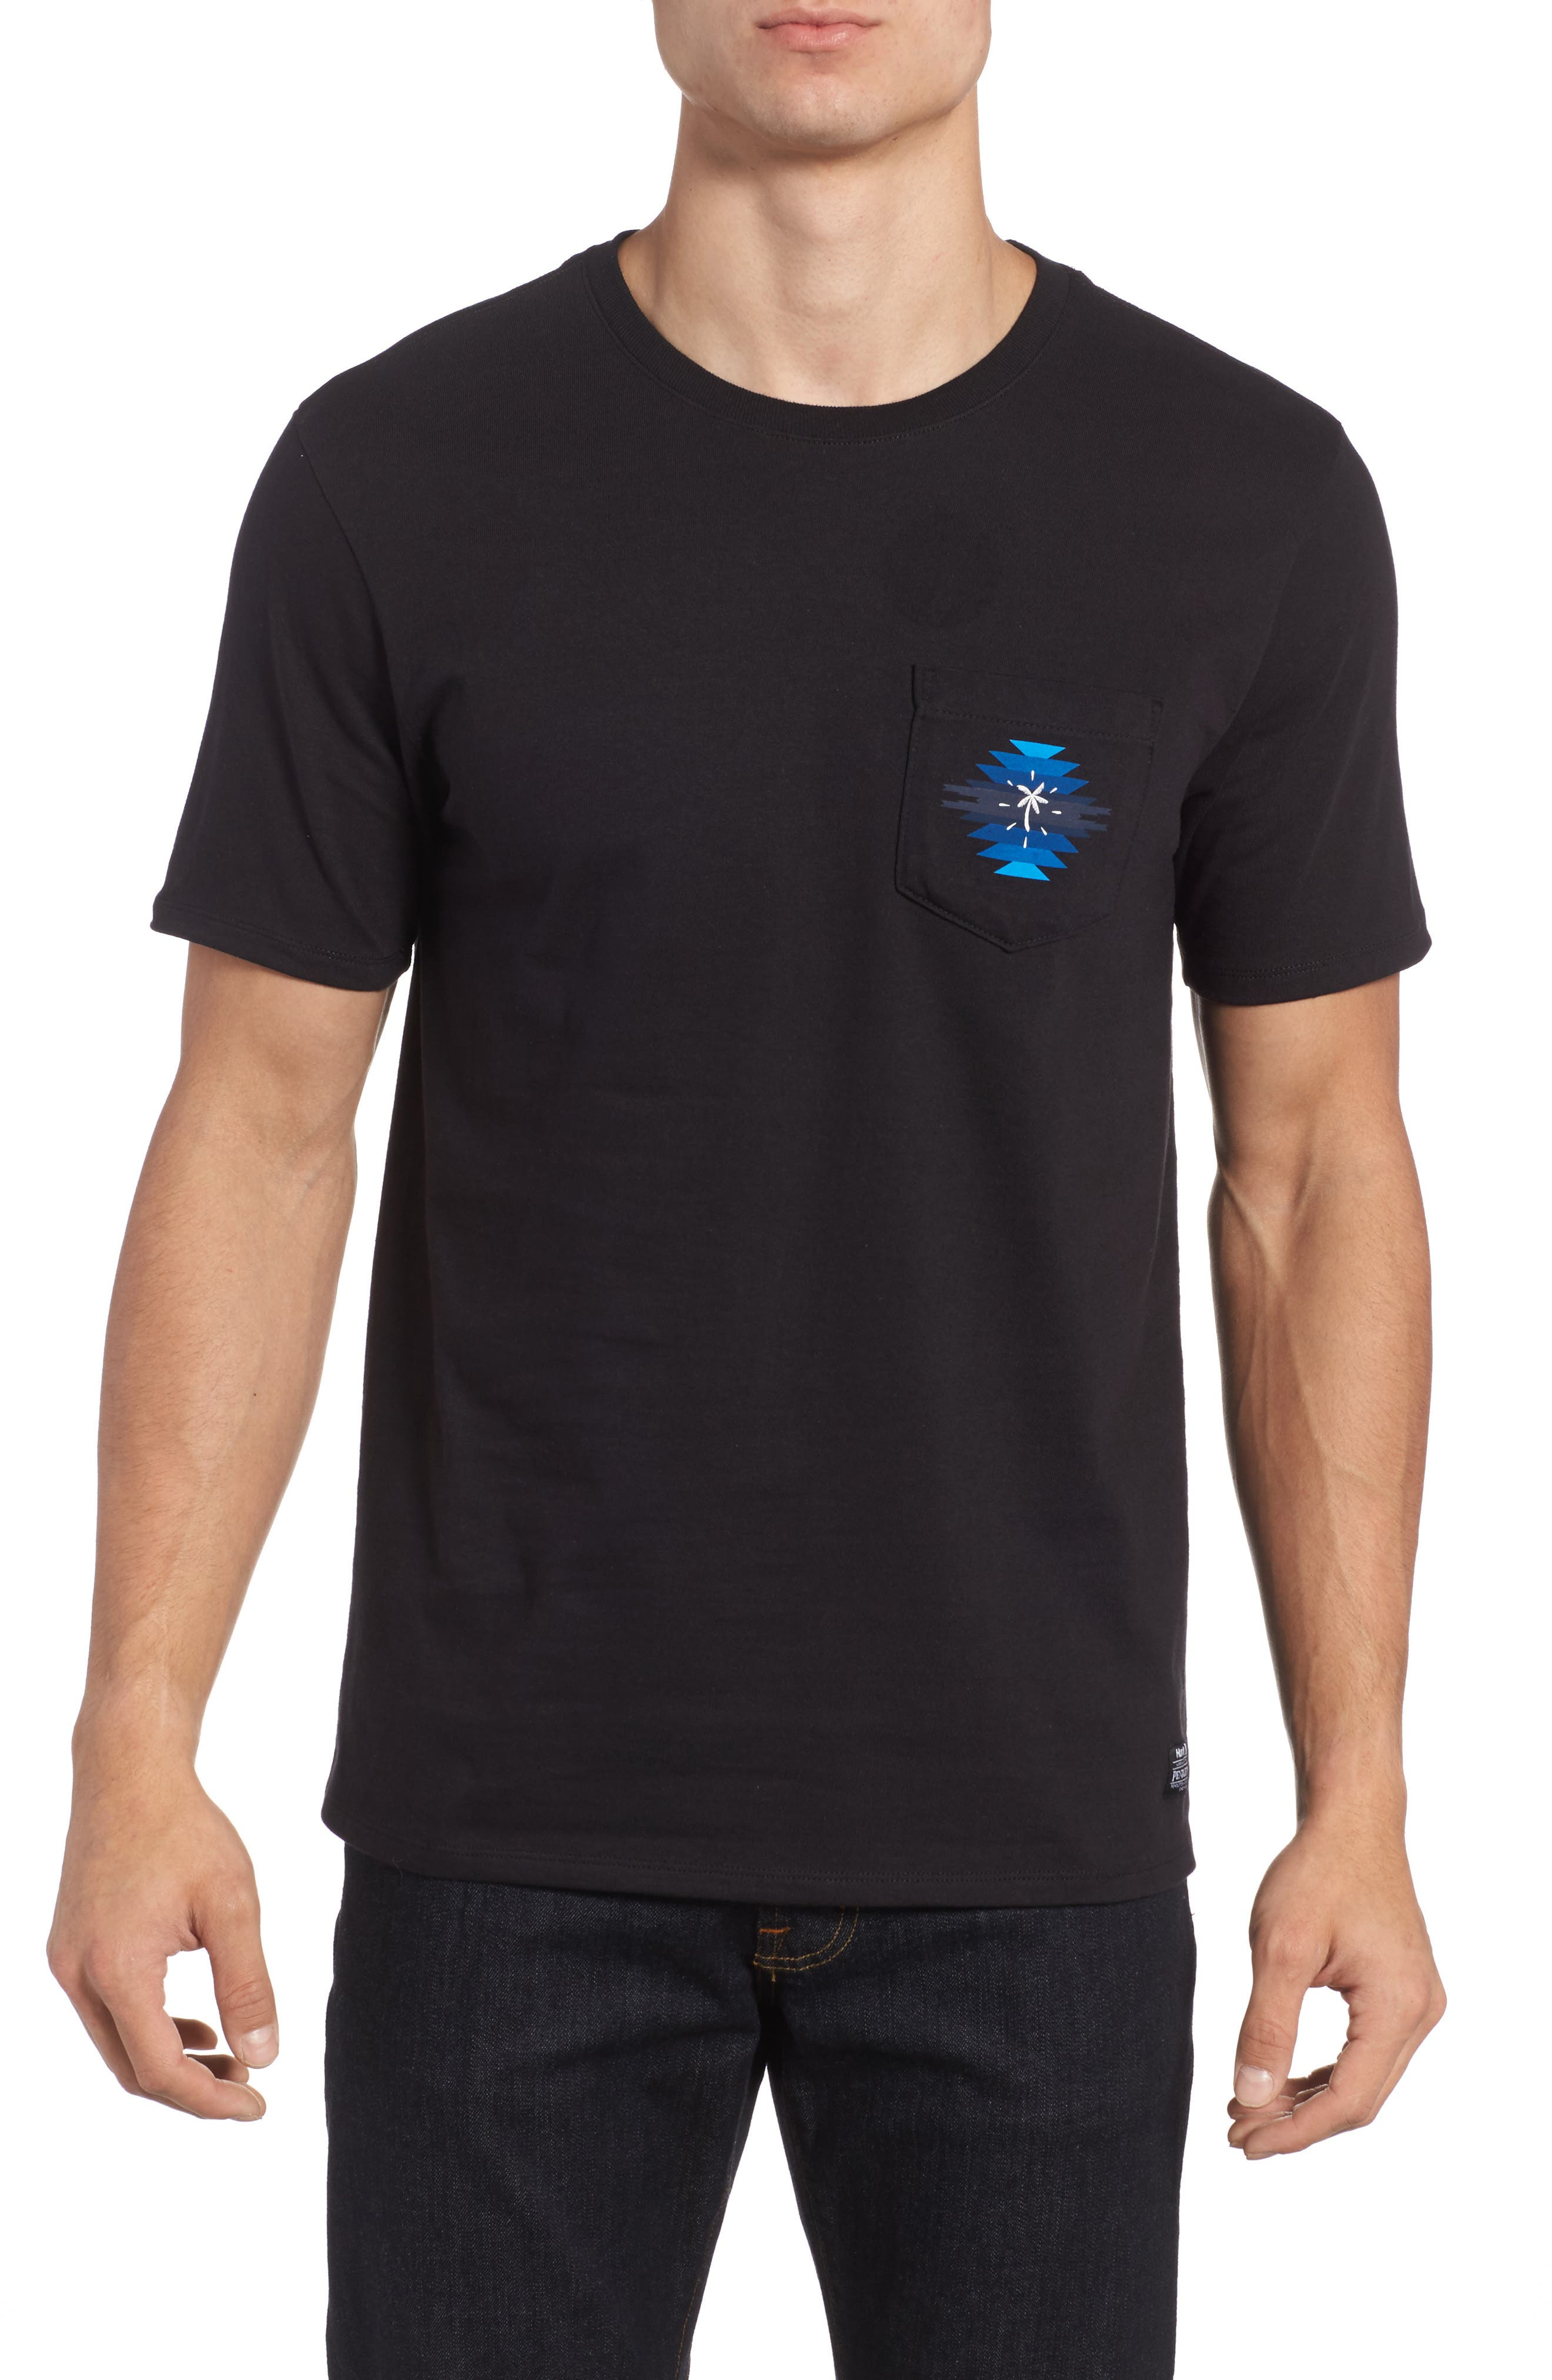 x Pendleton Pocket T-Shirt,                         Main,                         color, 010